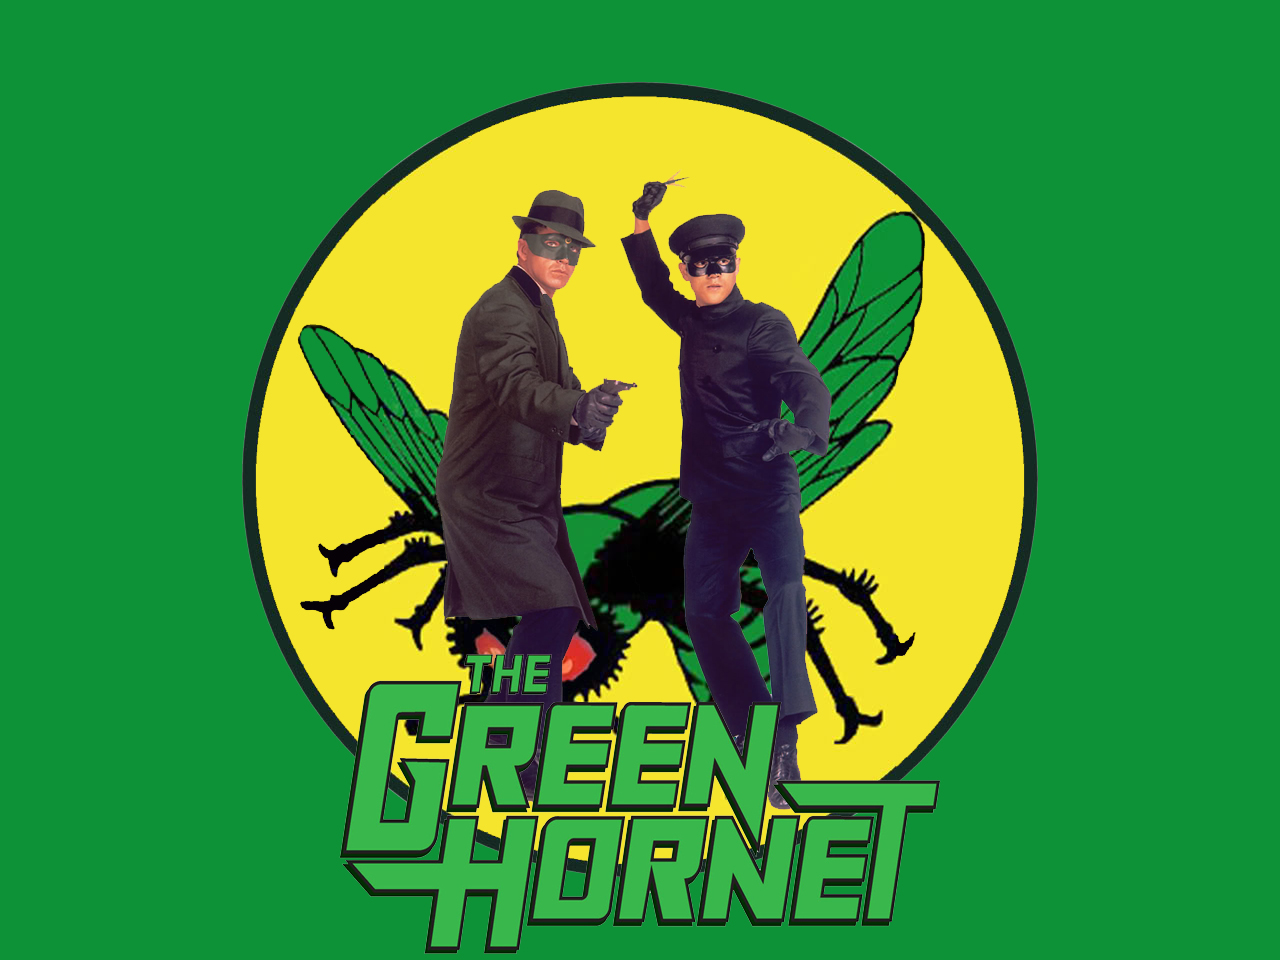 green_hornet_tv_wallpaper_by_swfan1977-d33zut3.jpg